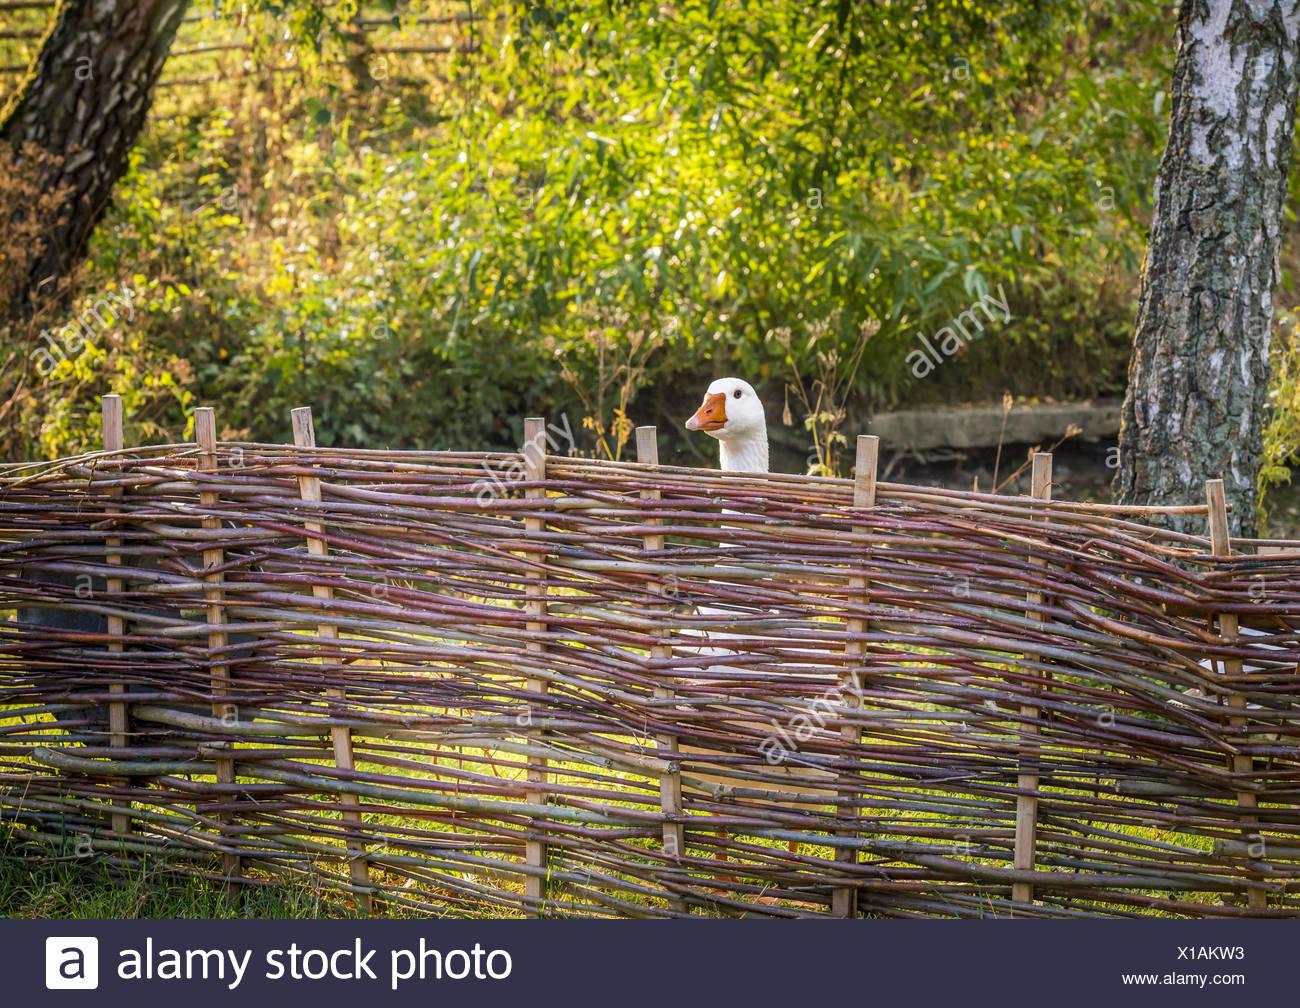 White goose behind farm fence - Stock Image